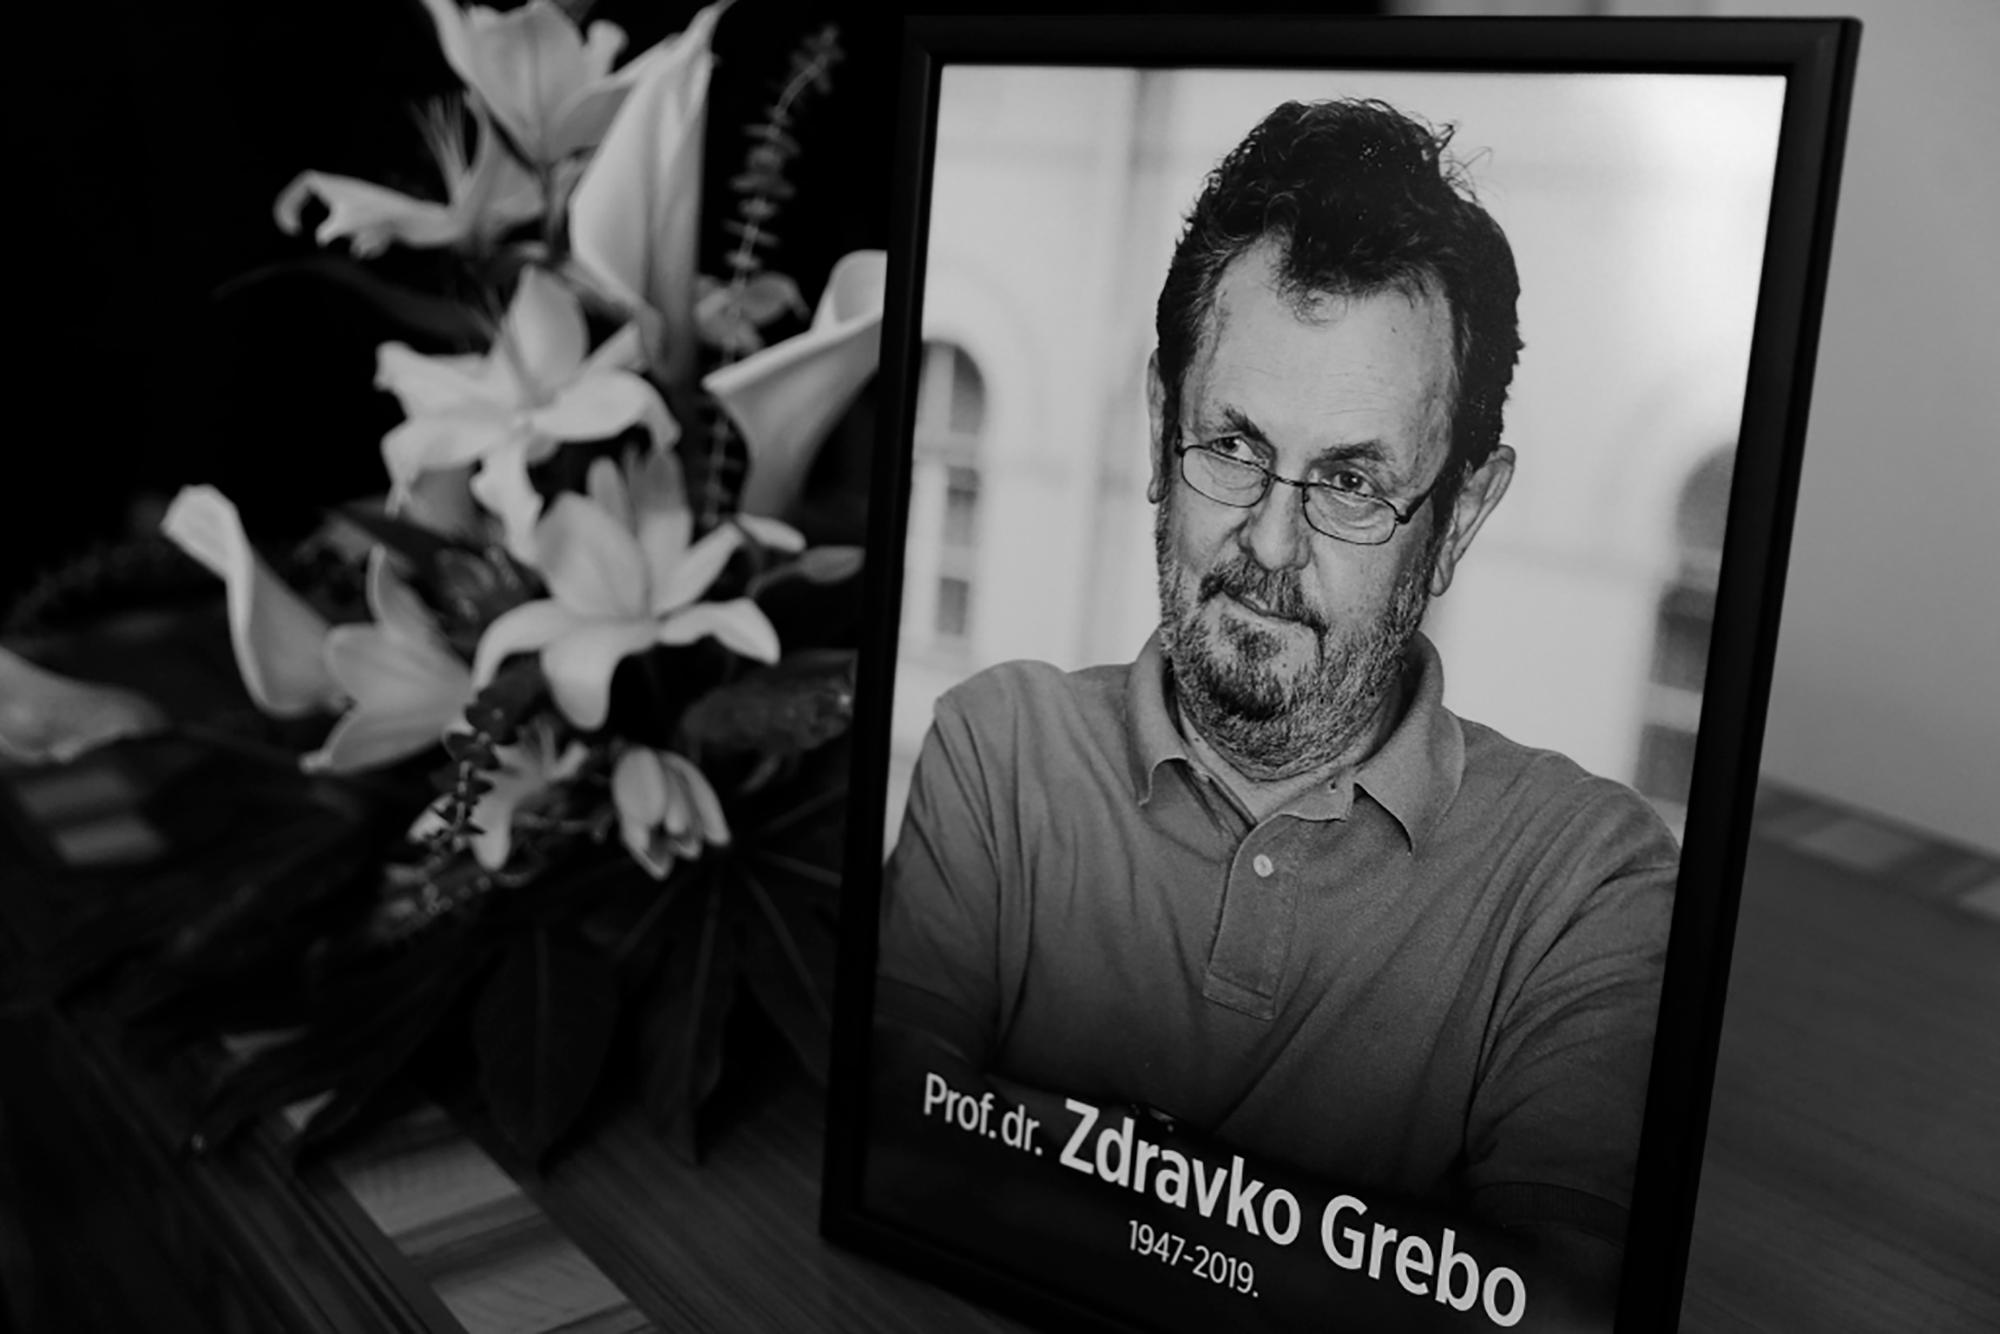 Sarajevo: Komemoracija povodom smrti Zdravka Grebe